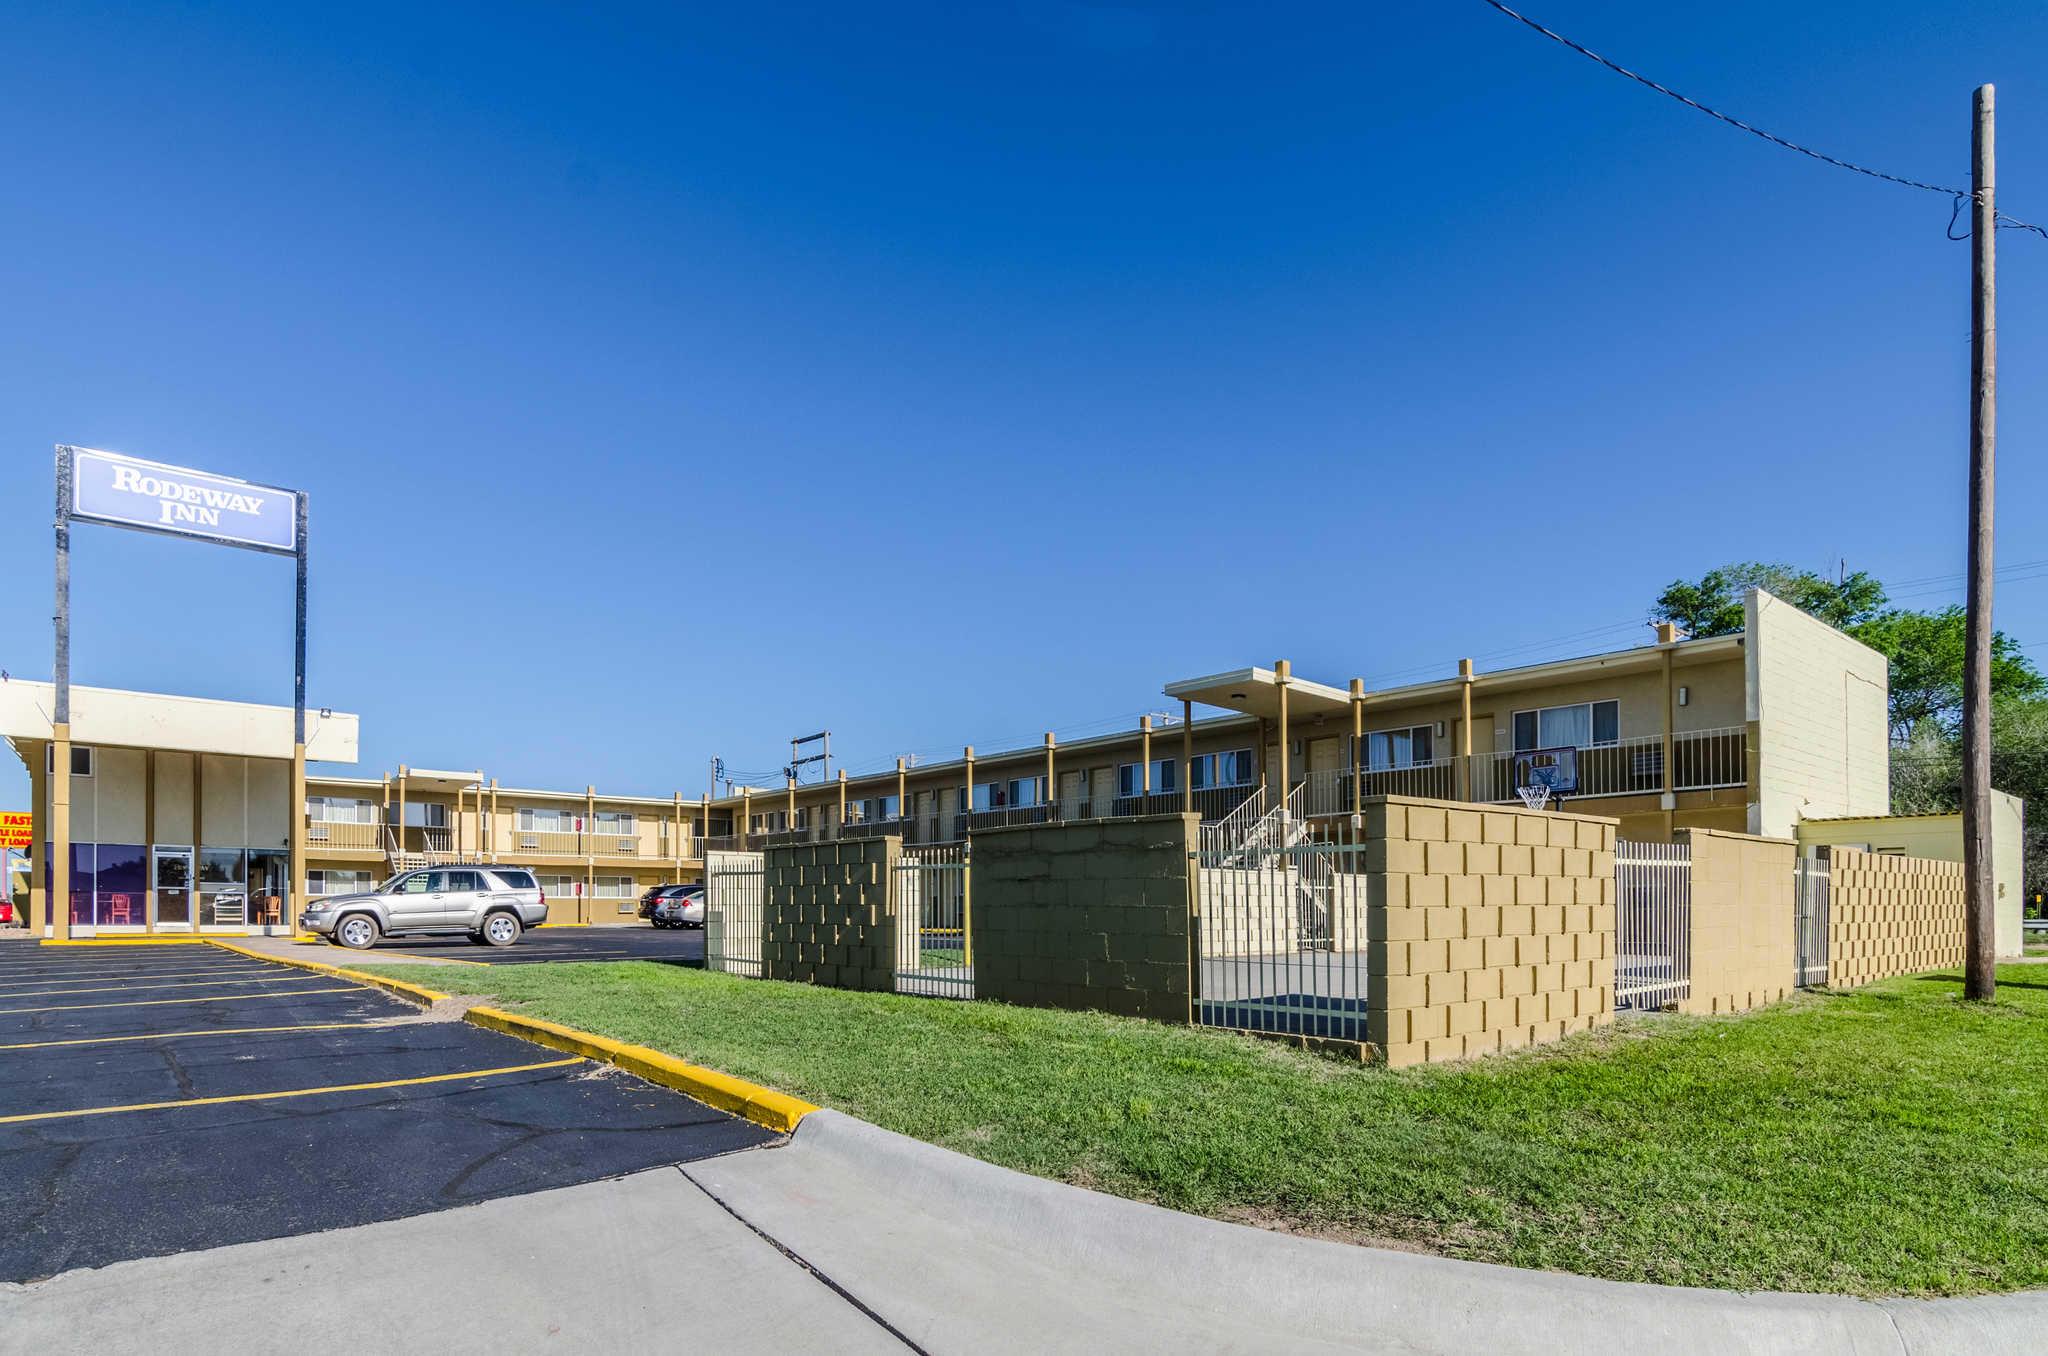 Rodeway Inn In Dodge City Ks 620 227 8